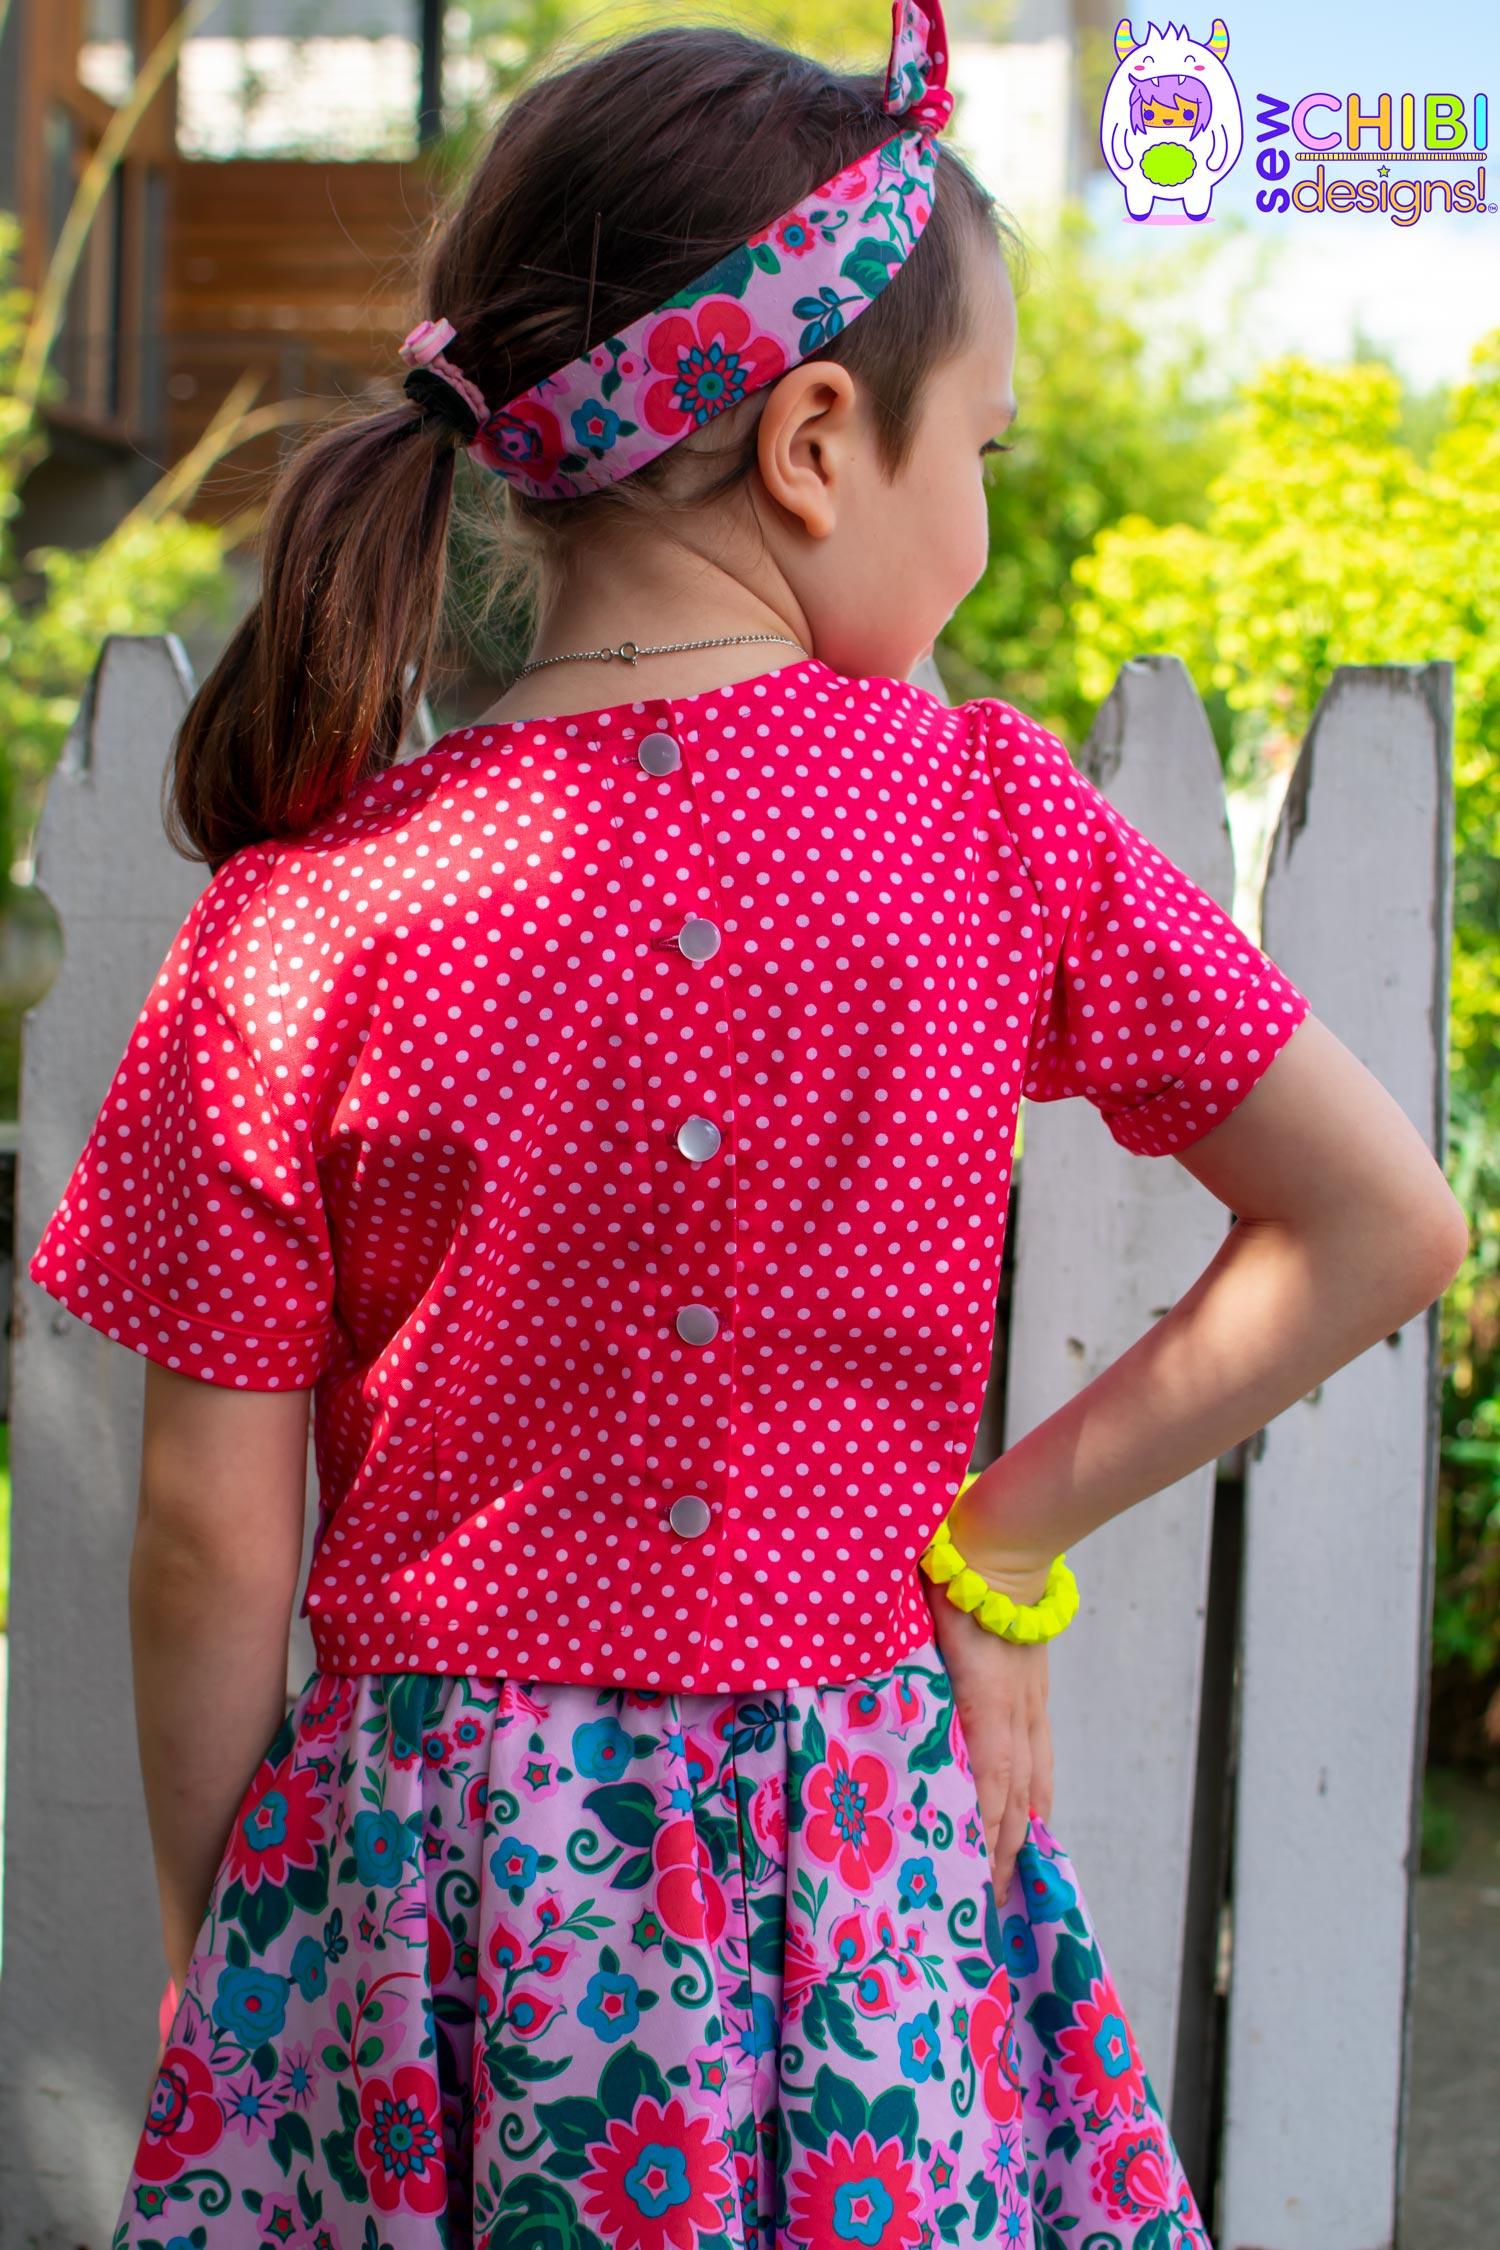 Sew-Chibi-Designs-Sew-Your-Stash-Ice-Cream-and-Sundays-1.jpg